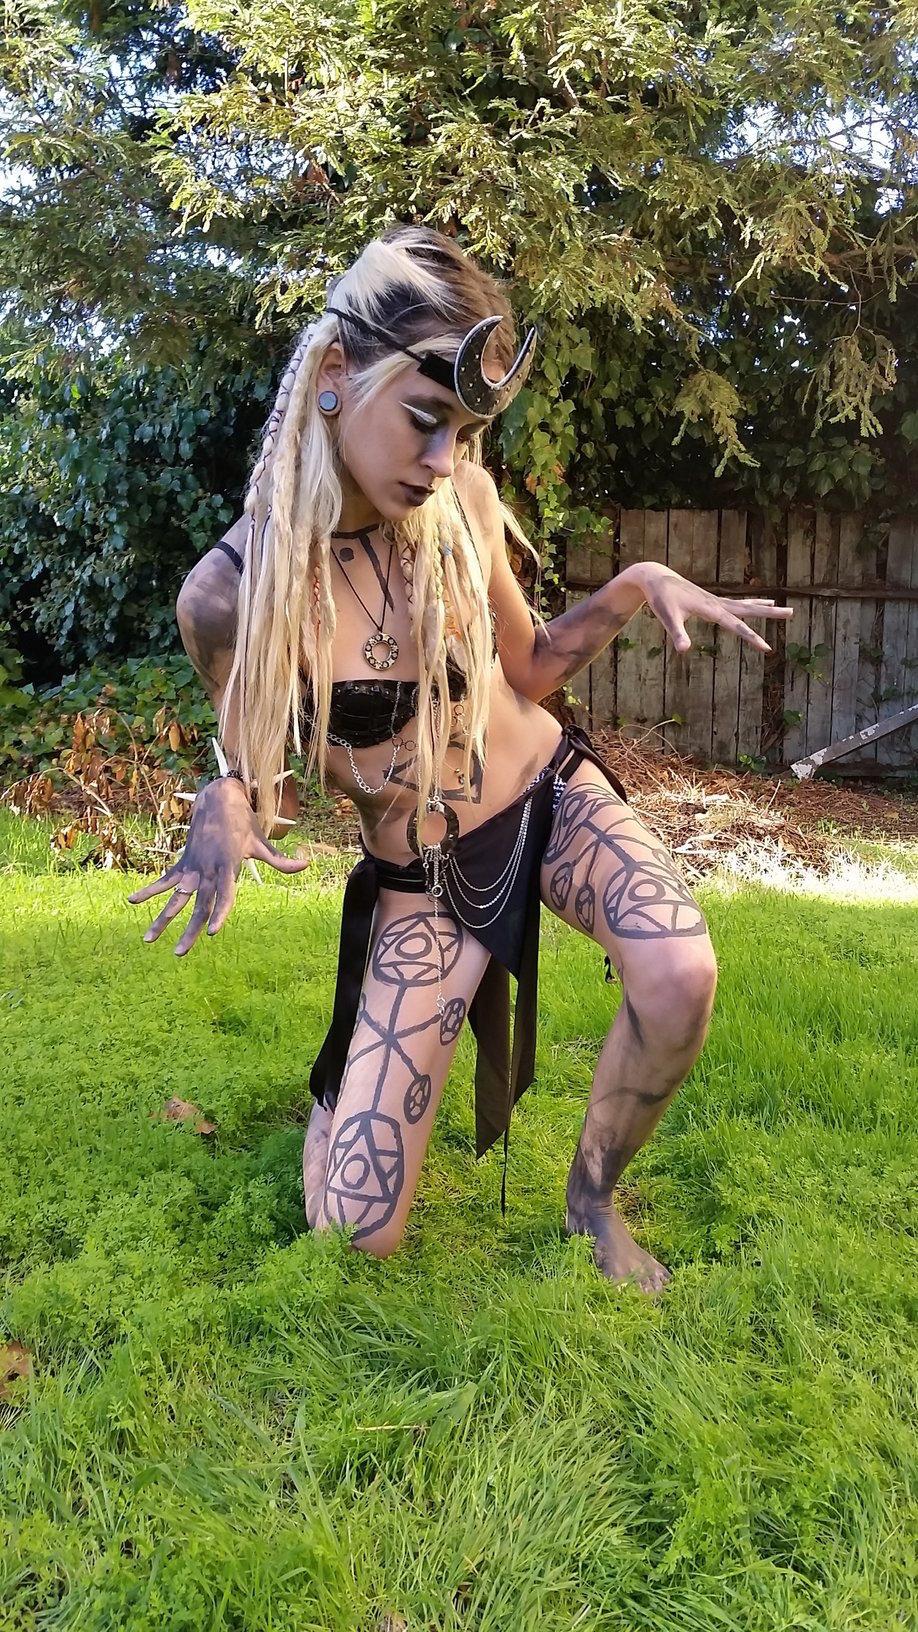 enchantress (suicide squad) costume - costume yeti